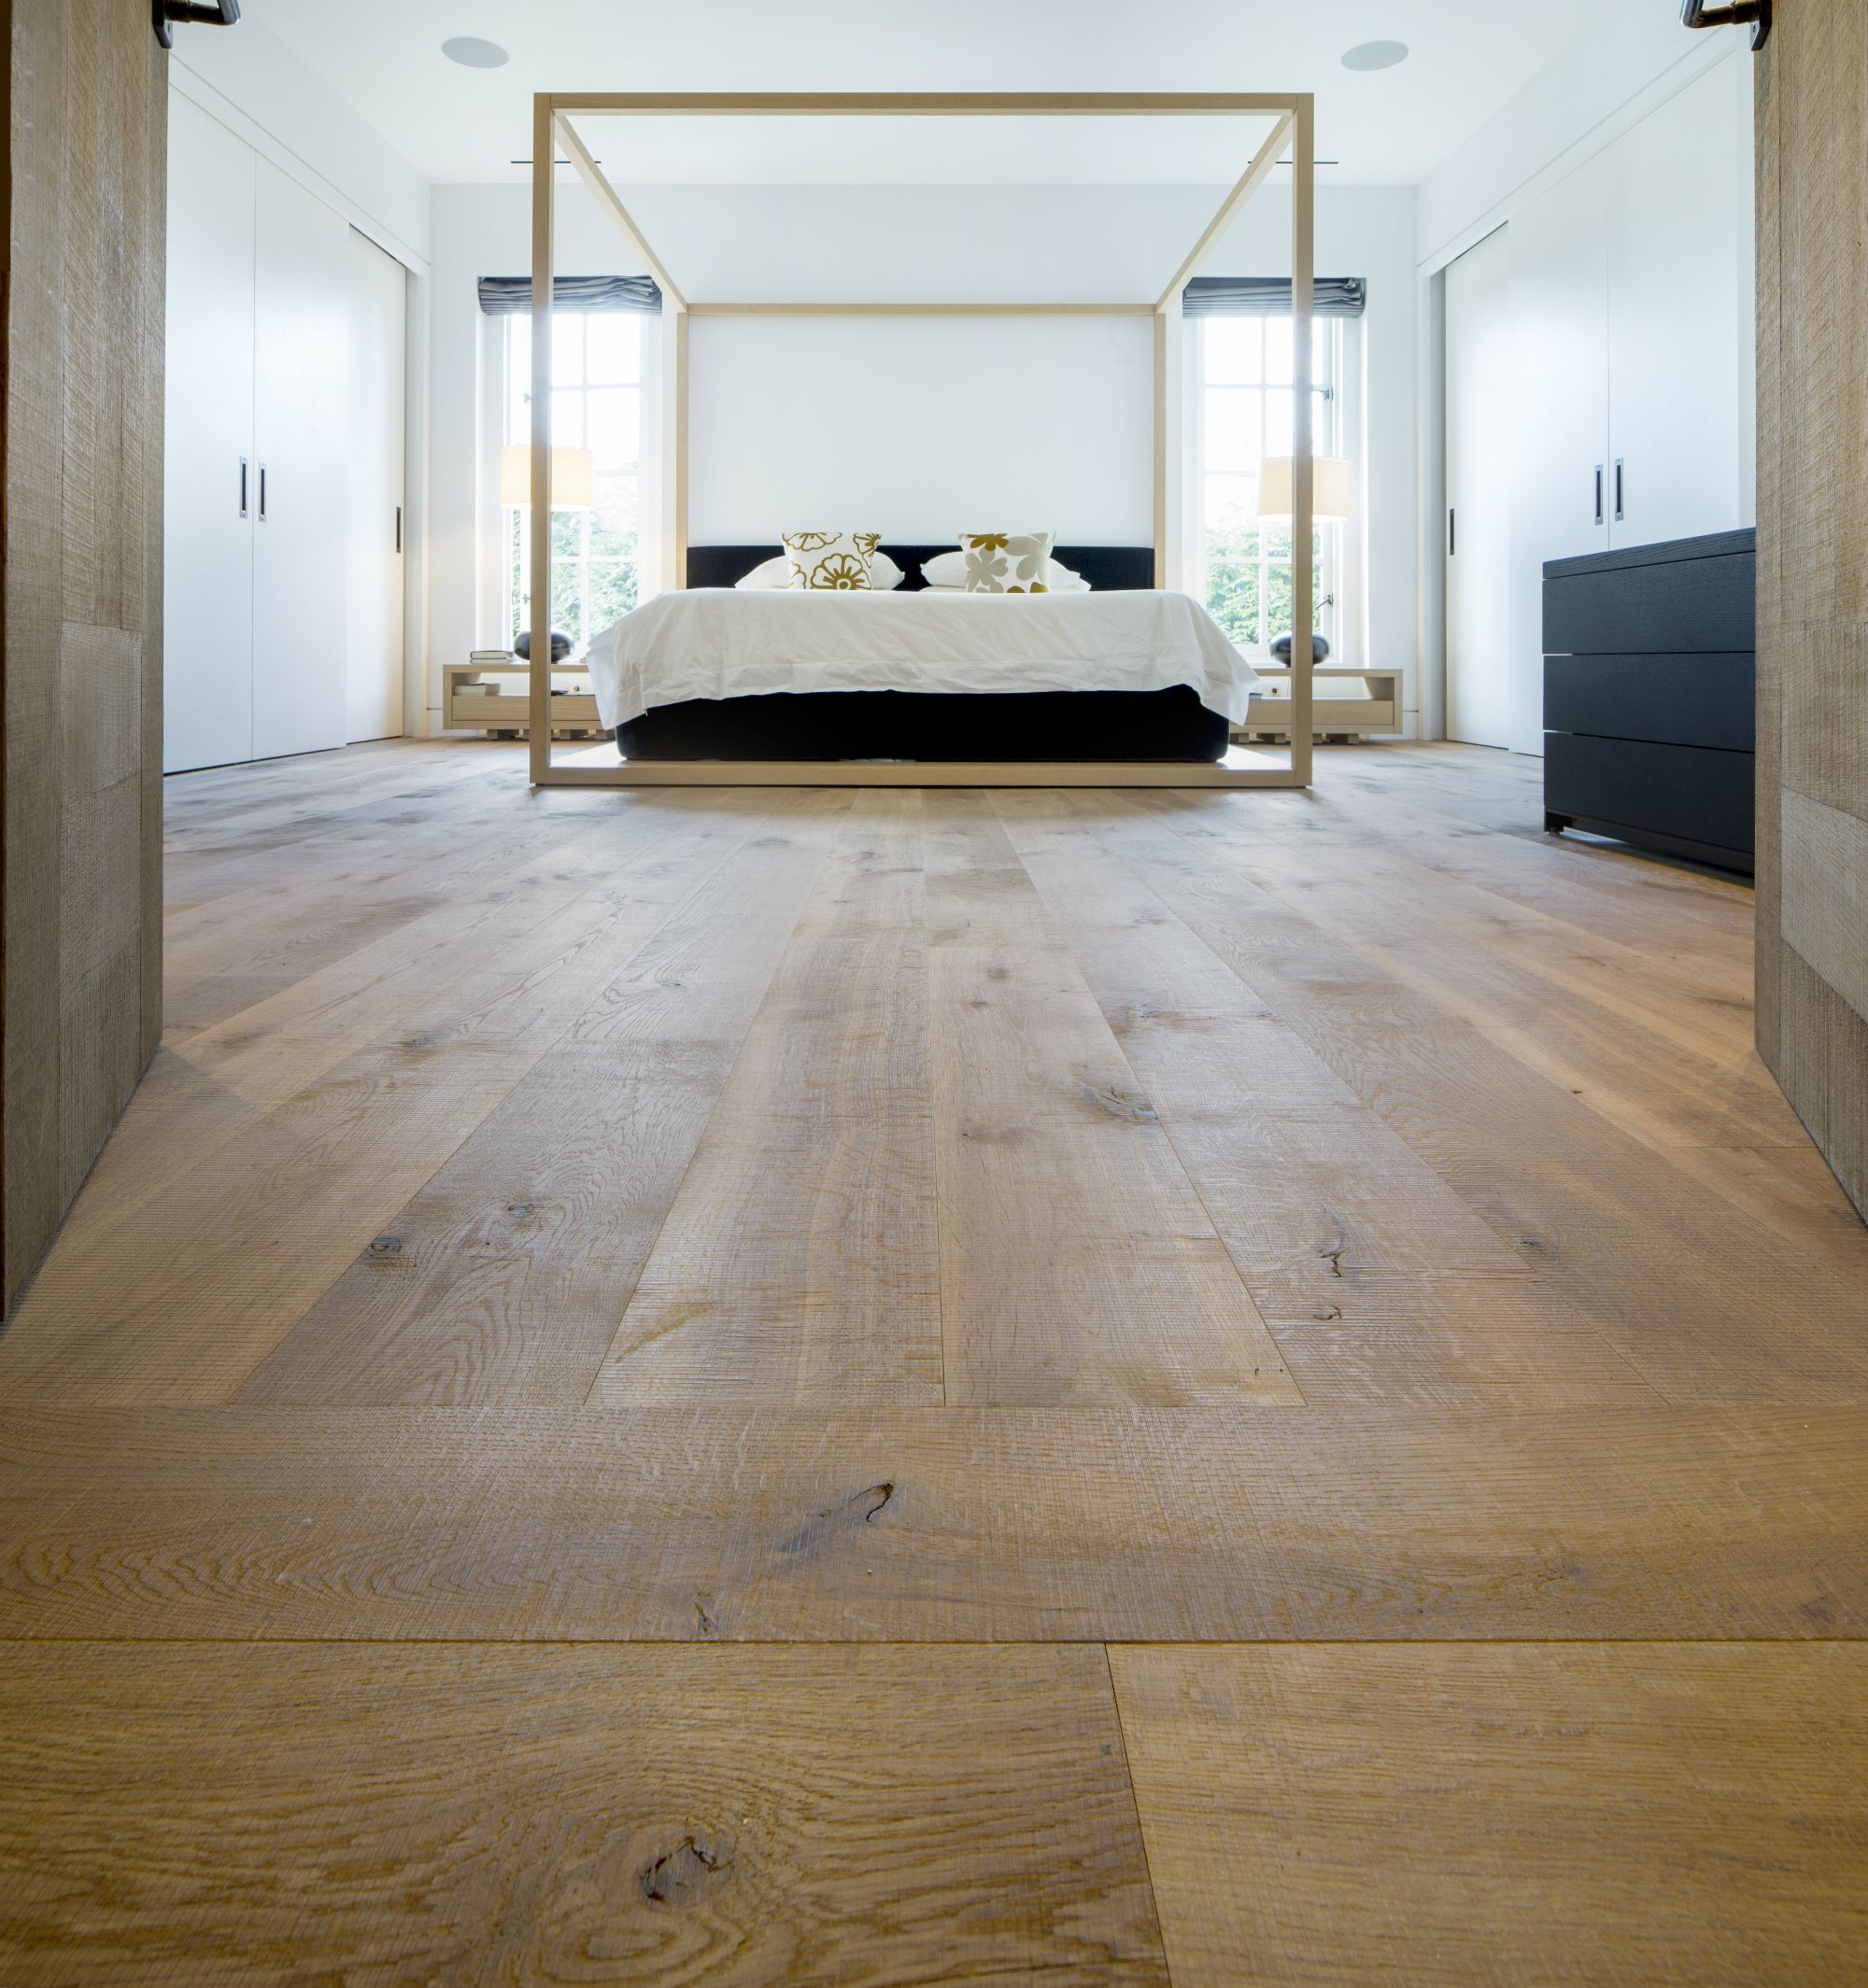 Hakwood Flooring European Oak Sierra Collection